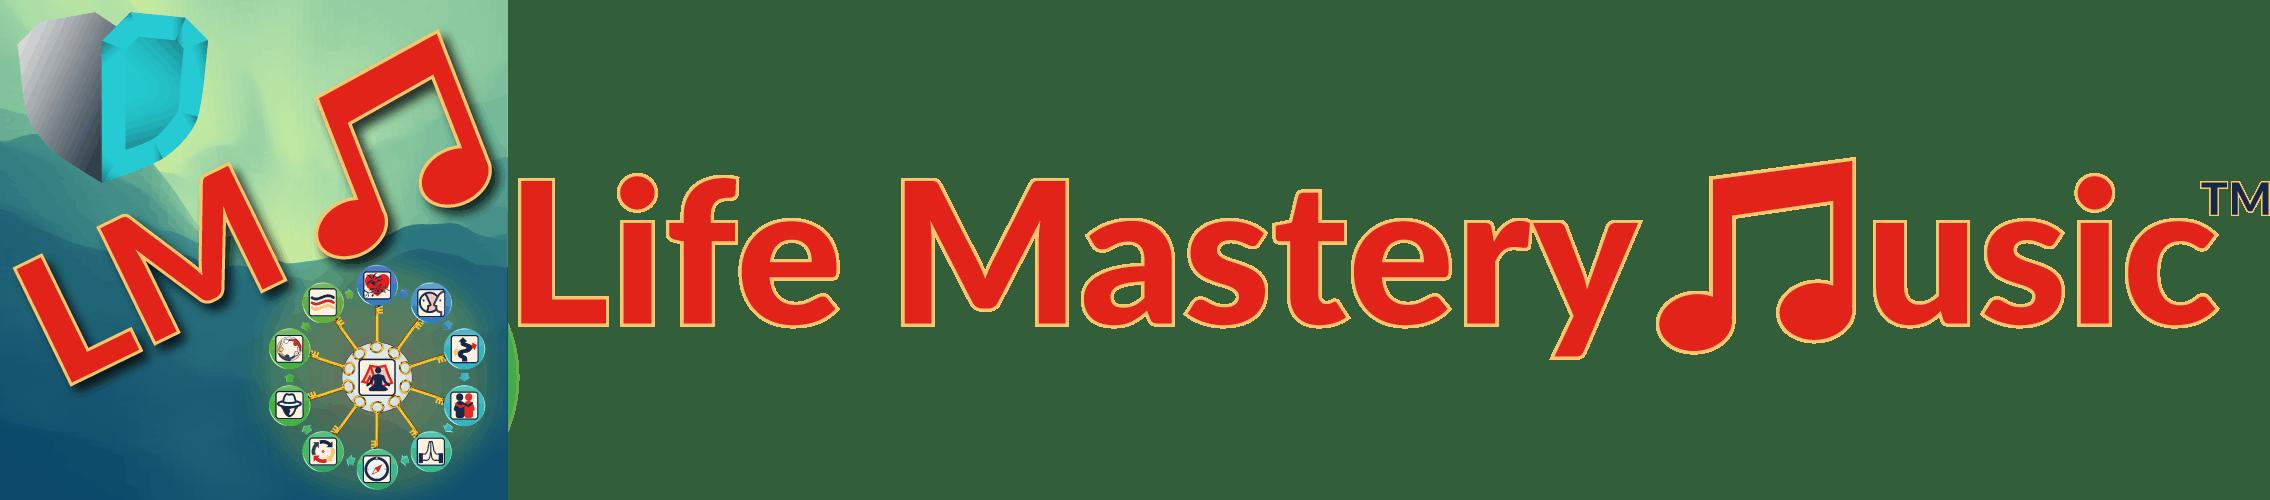 Life Mastery Music